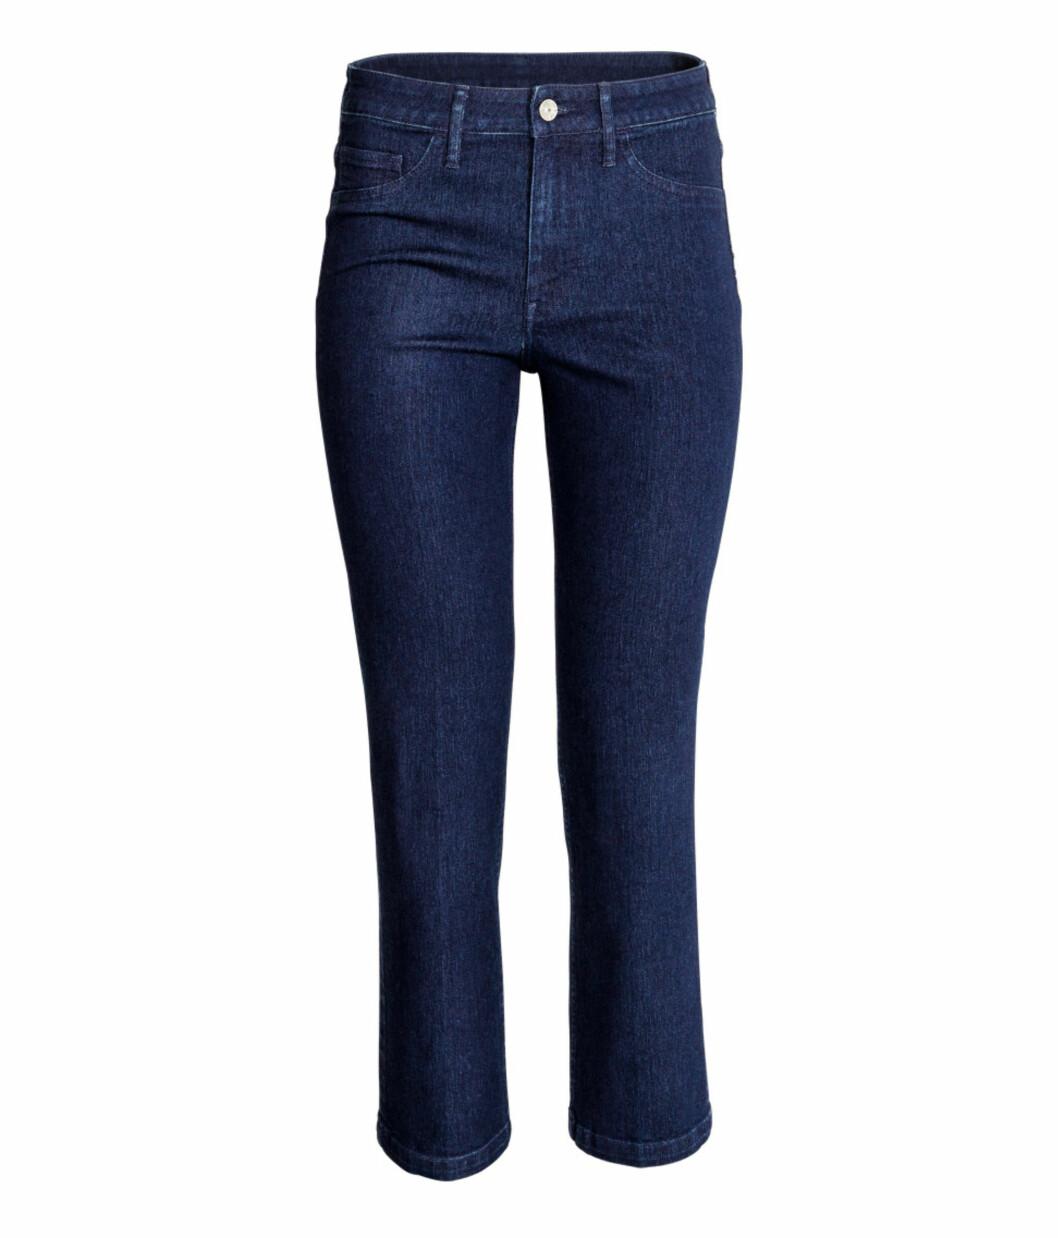 Jeans i ankellengde fra H&M | kr 99 | http://www.hm.com/no/product/55241?article=55241-B